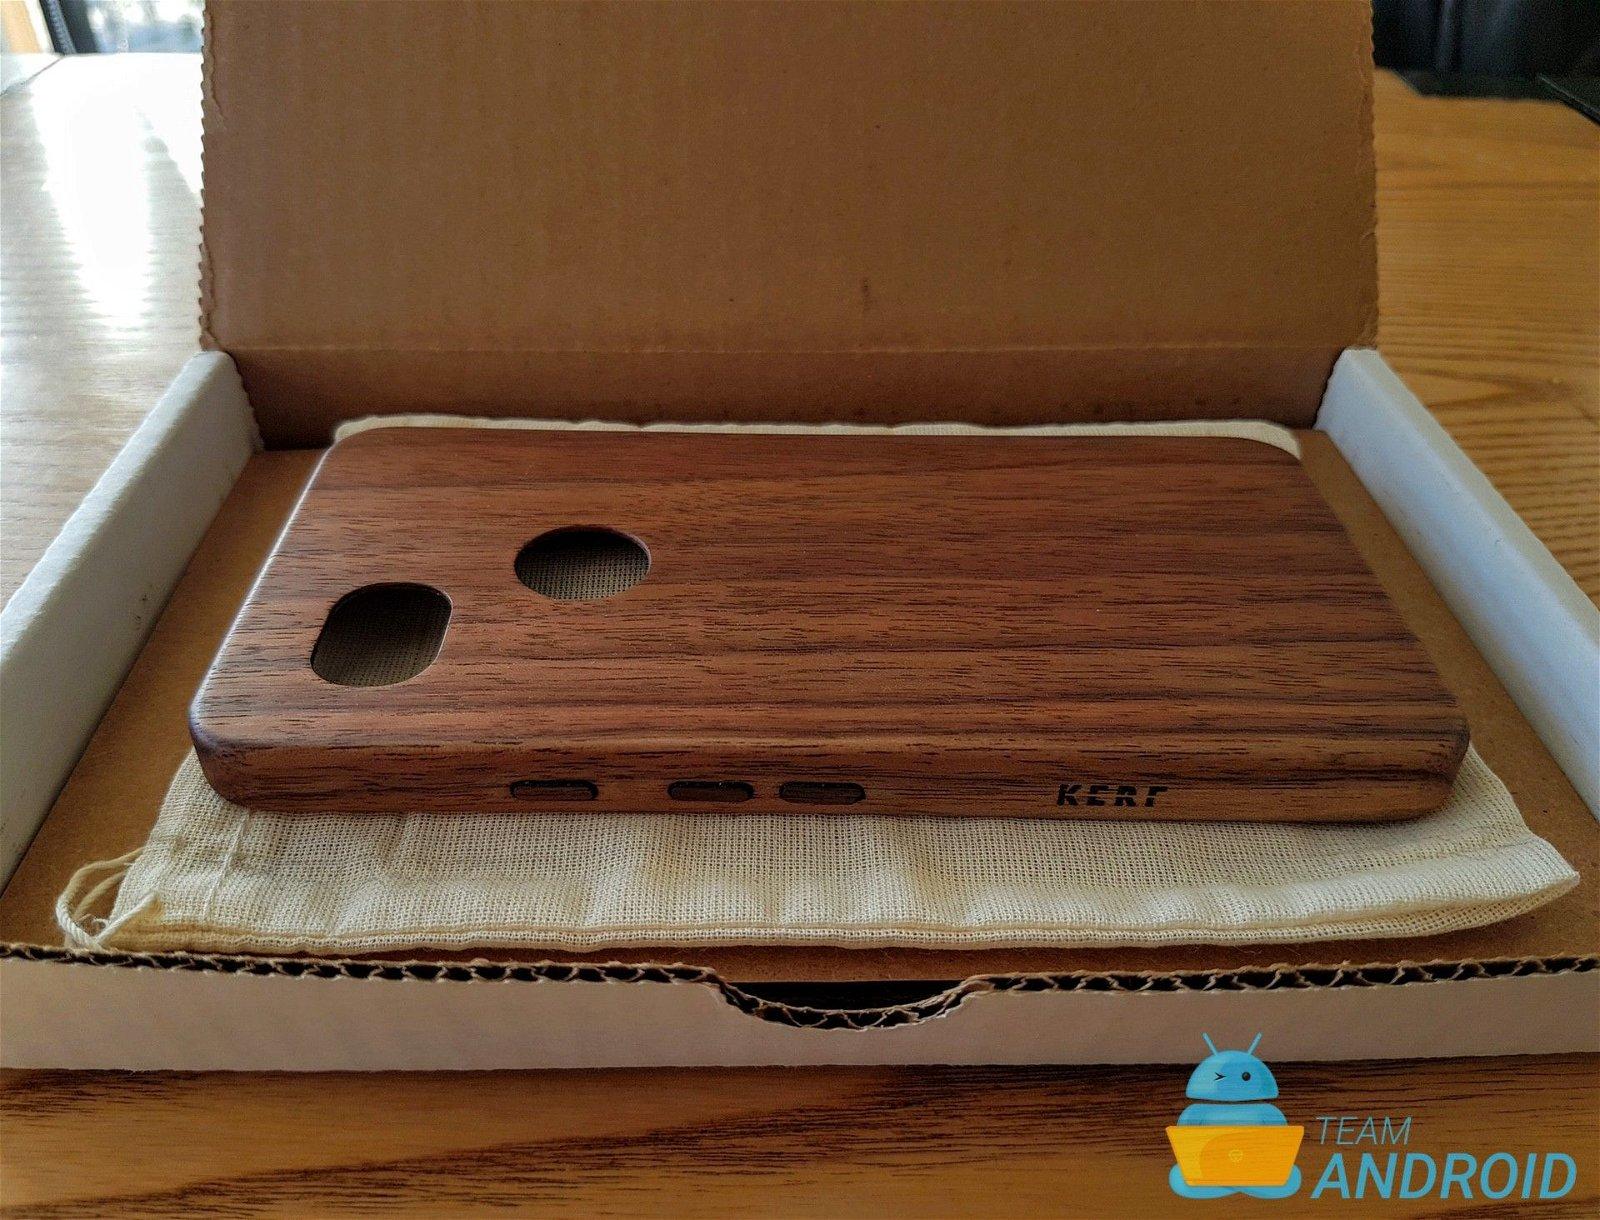 competitive price 6c2fc 2132d KerfCase Wood Case Review for Google Pixel 2 XL